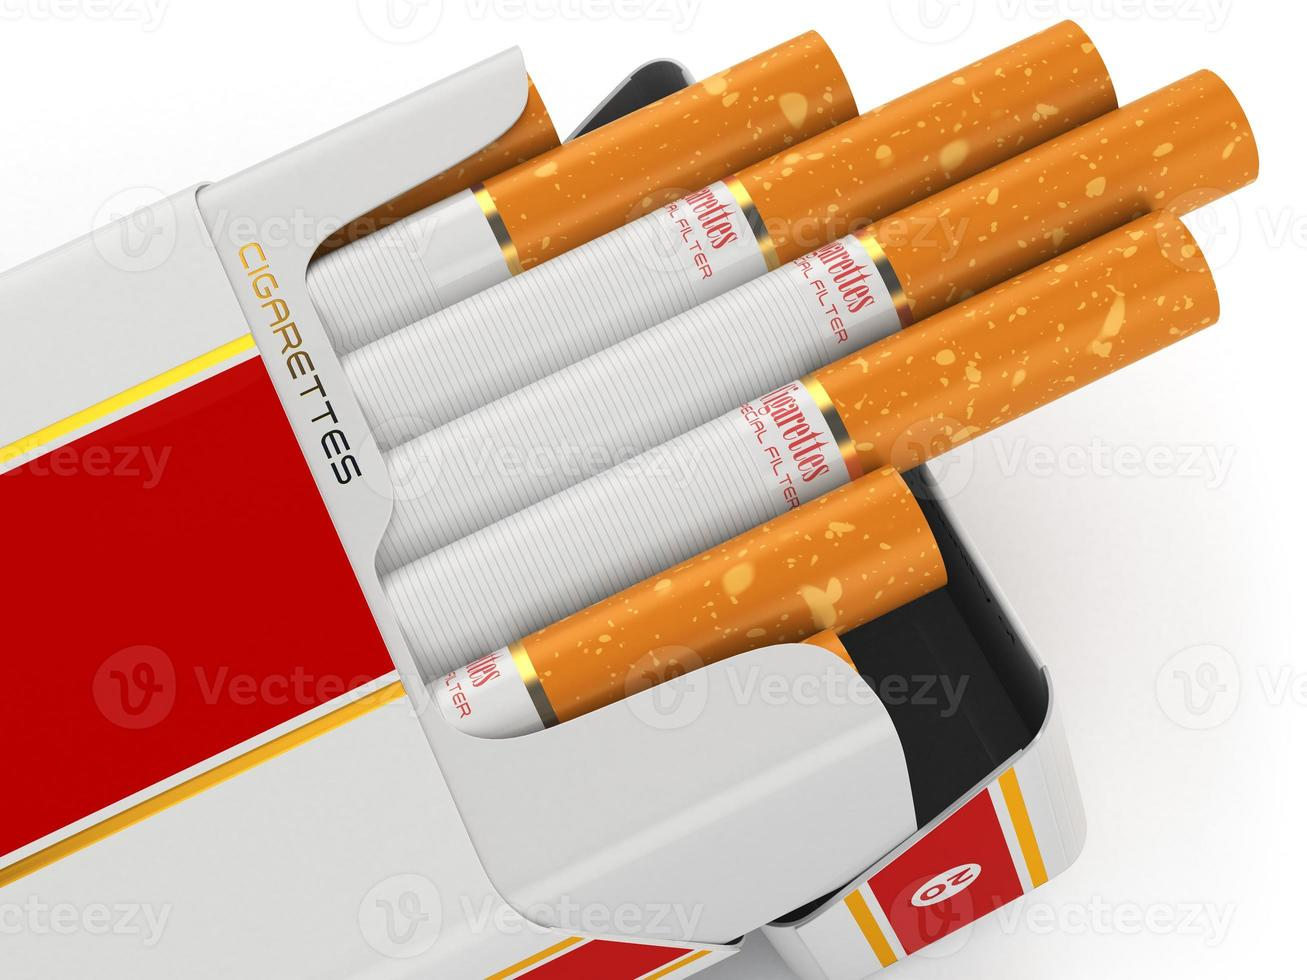 generisk cigarettpaket på vit bakgrund. foto